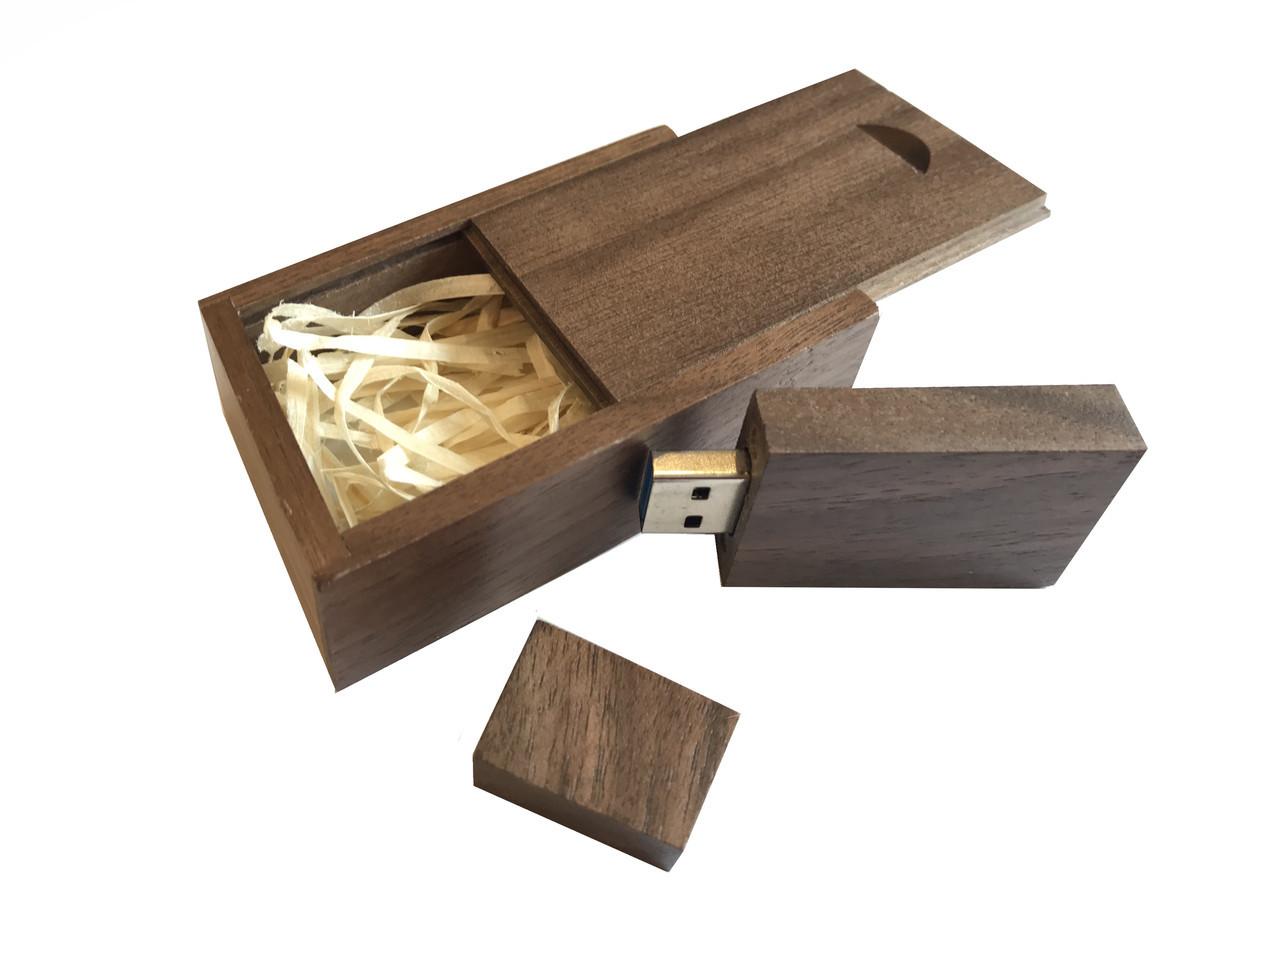 Флешка SUNROZ Wooden USB Flash Drive деревяный флеш накопитель в коробке 32 Gb USB 3.0 Коричневый (SUN0822)